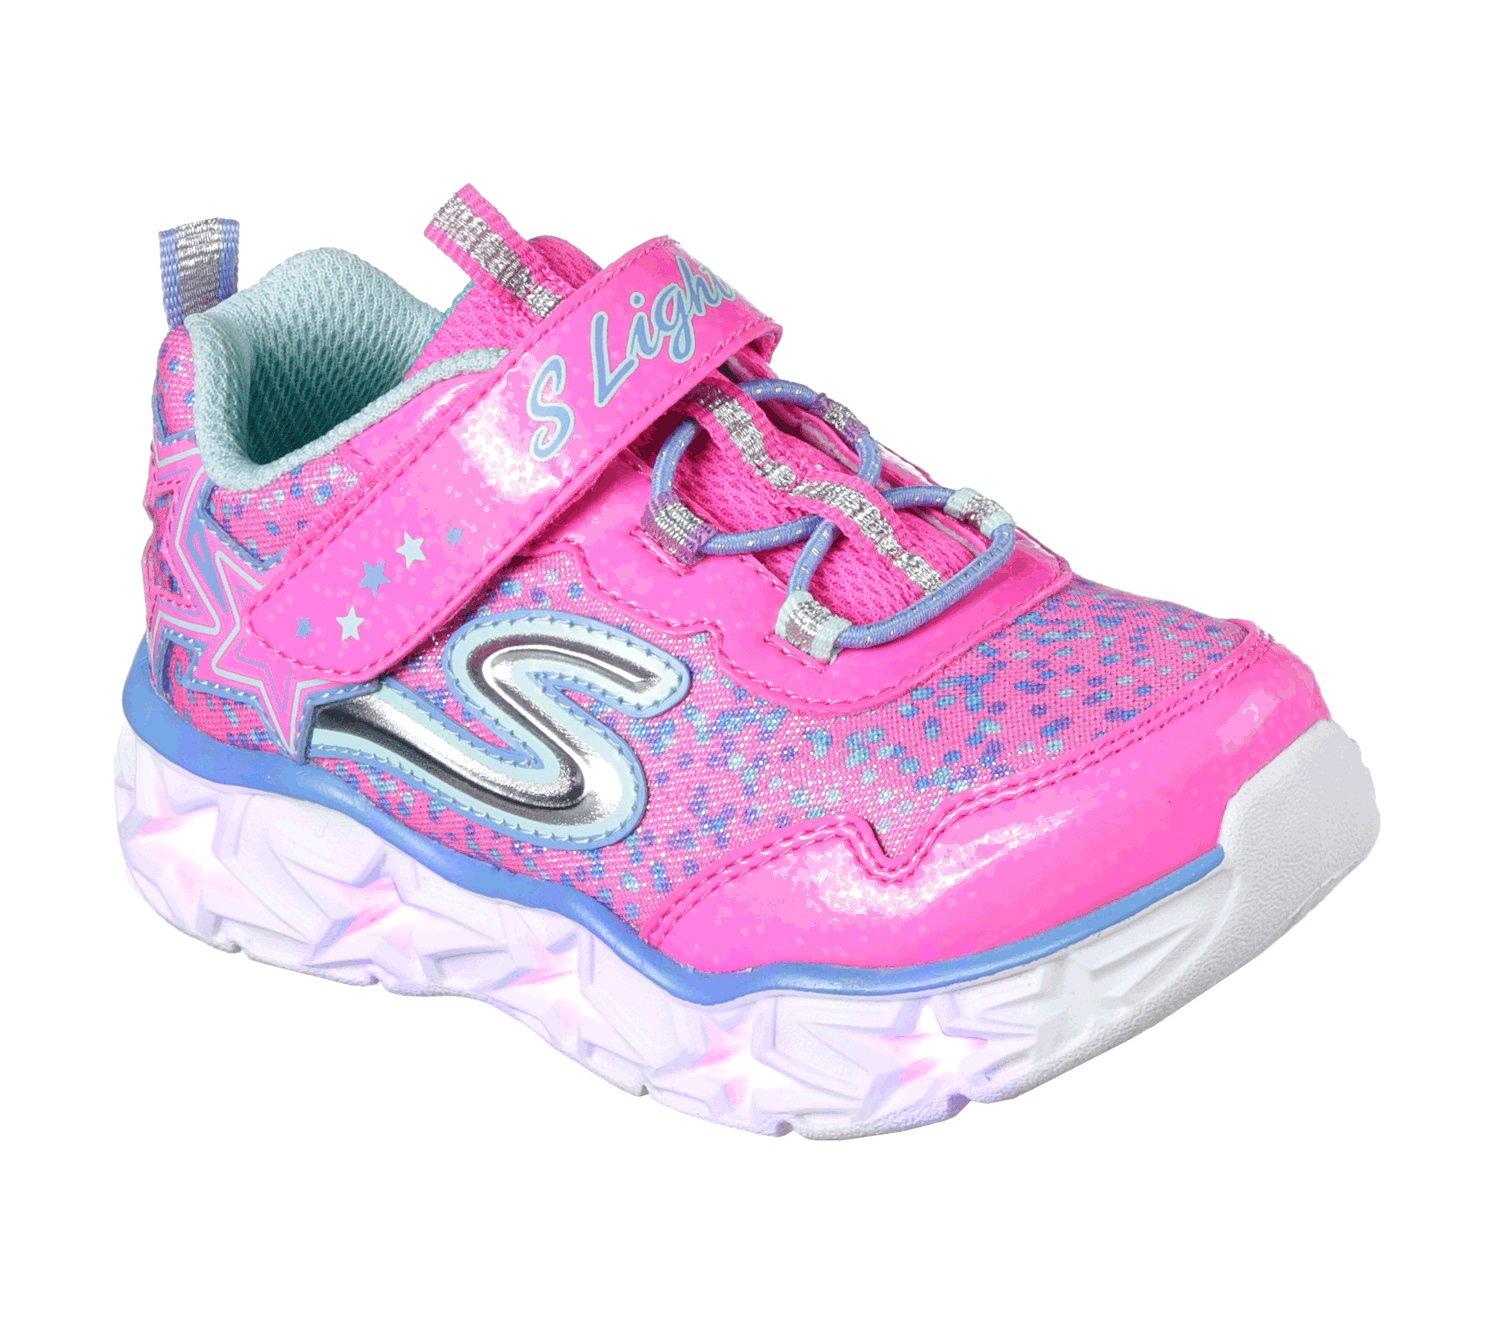 Skechers Galaxy Lights, Galaxy Baskets Baskets Fille Neon Lights, Pink/Multi 57300f5 - fast-weightloss-diet.space